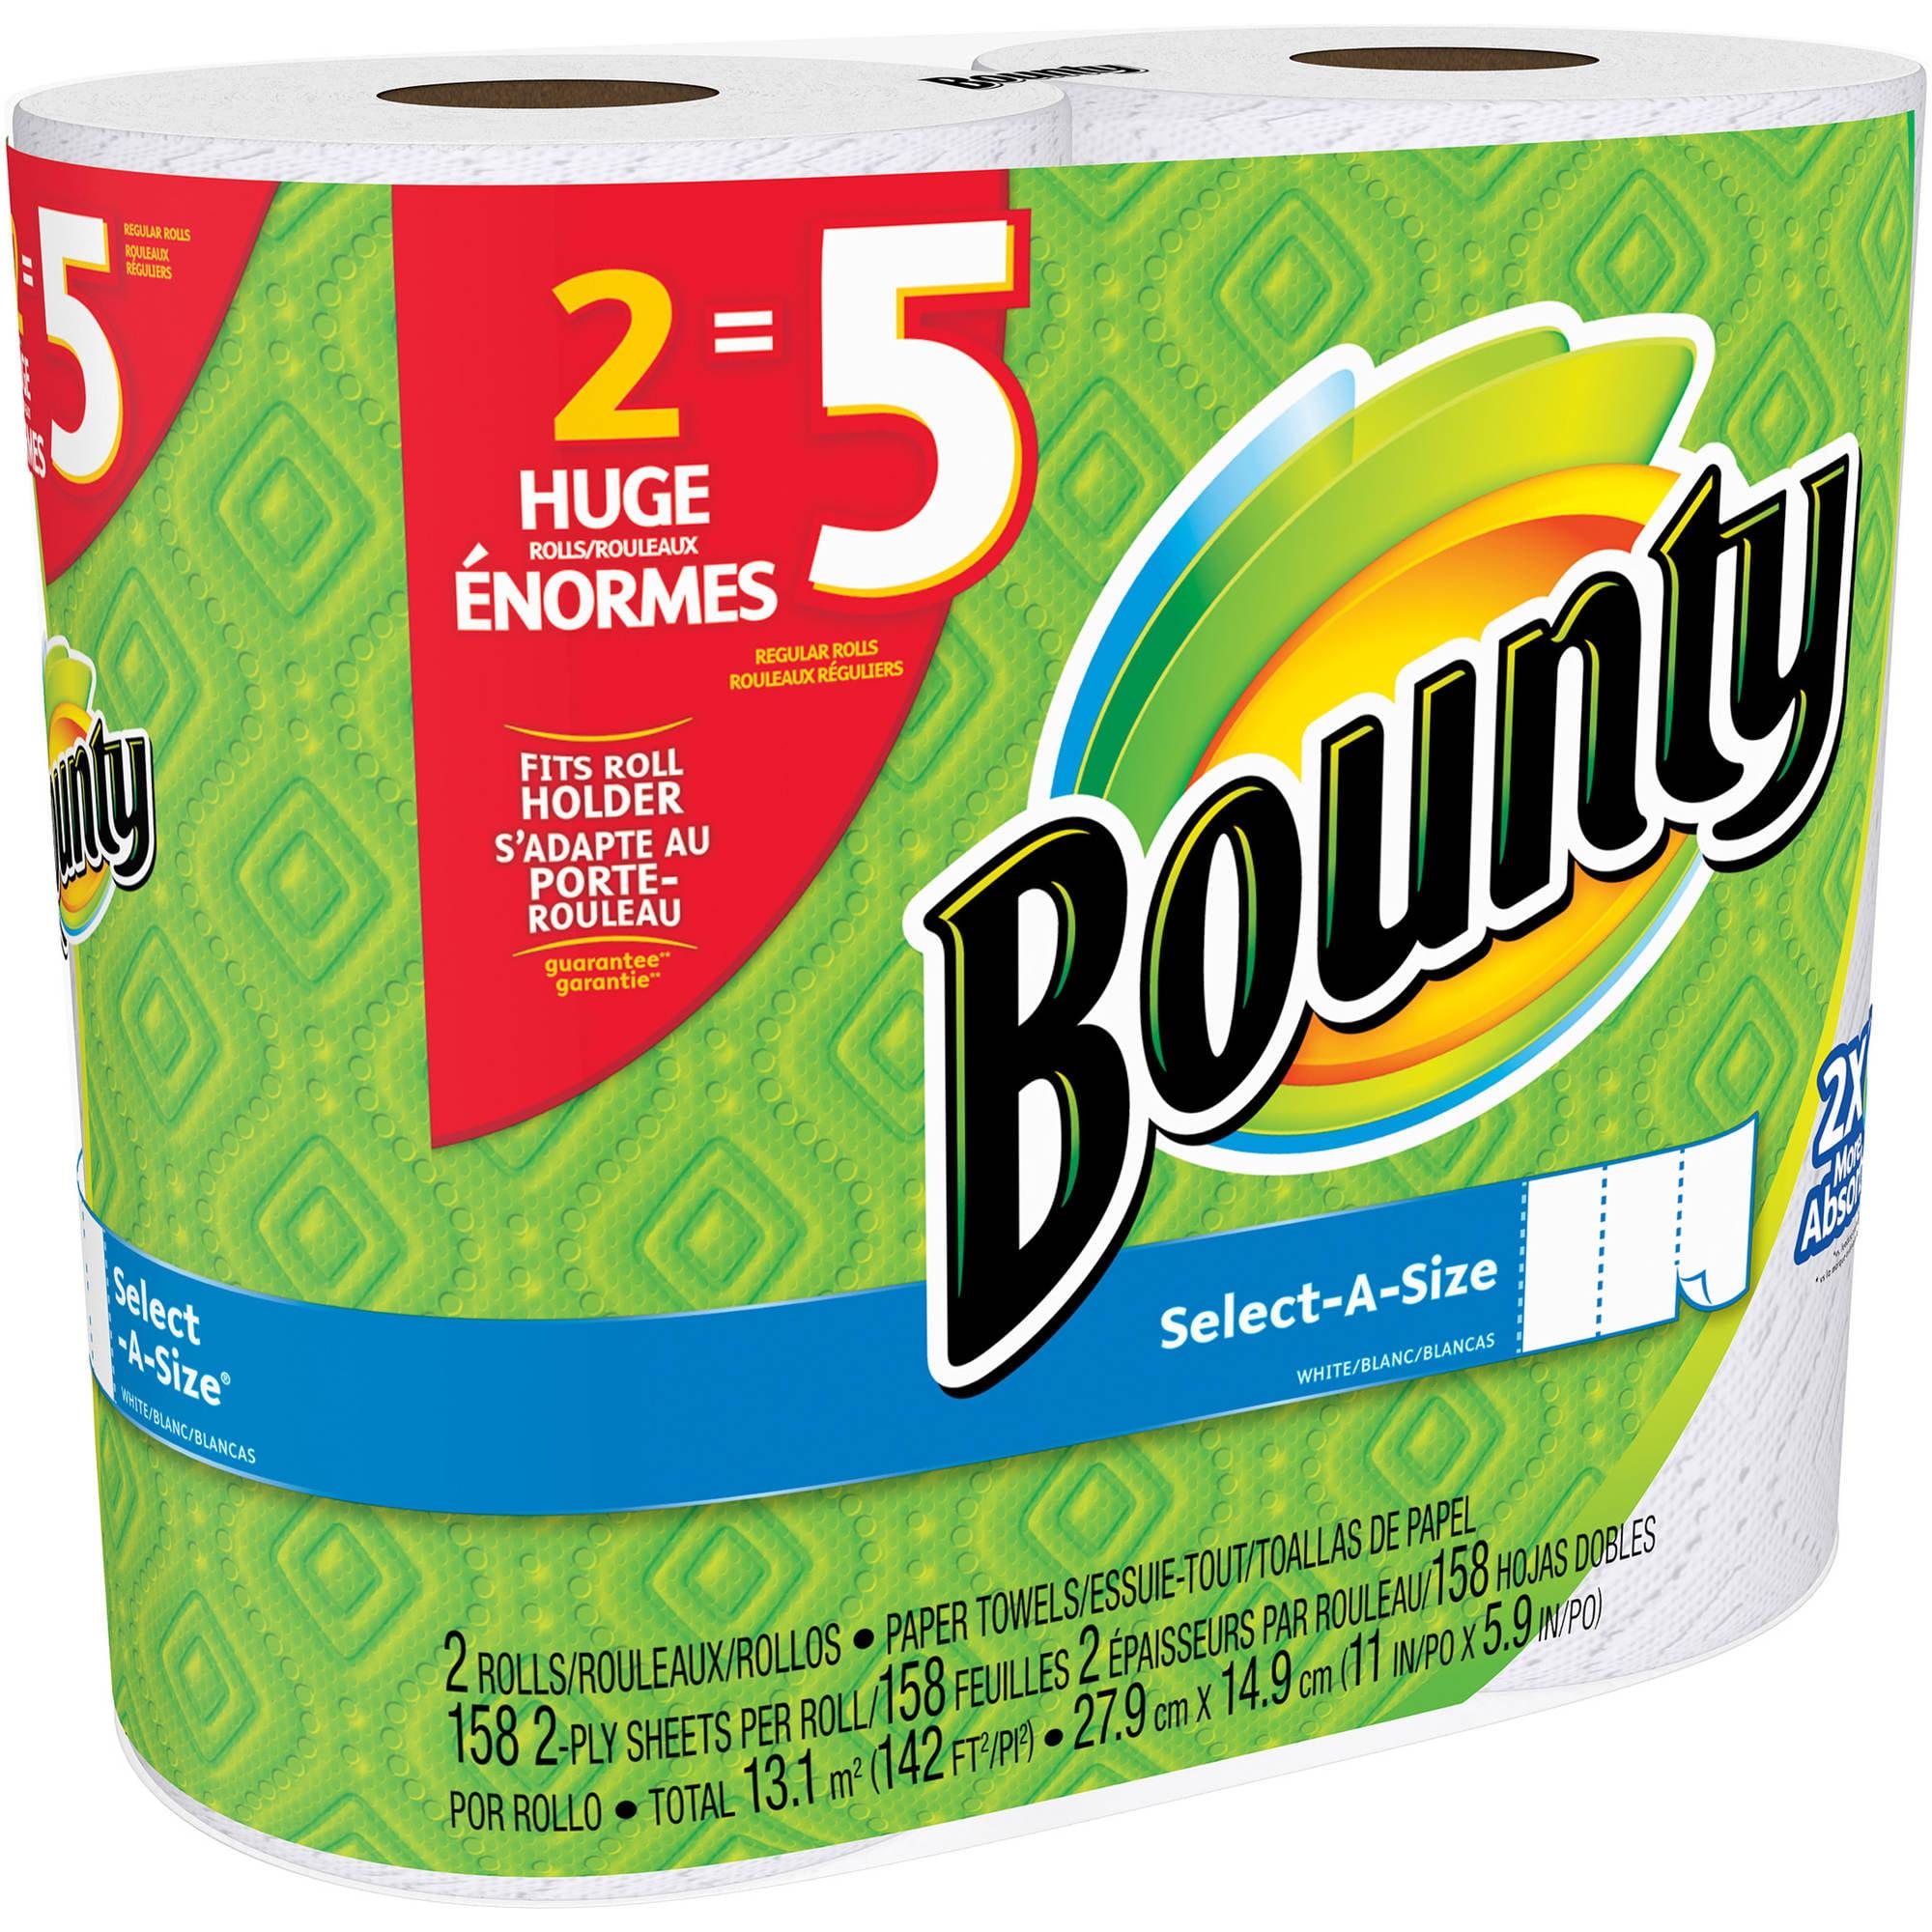 Bounty Select-A Size Paper Towels Huge Rolls, 158 sheets, 2 rolls